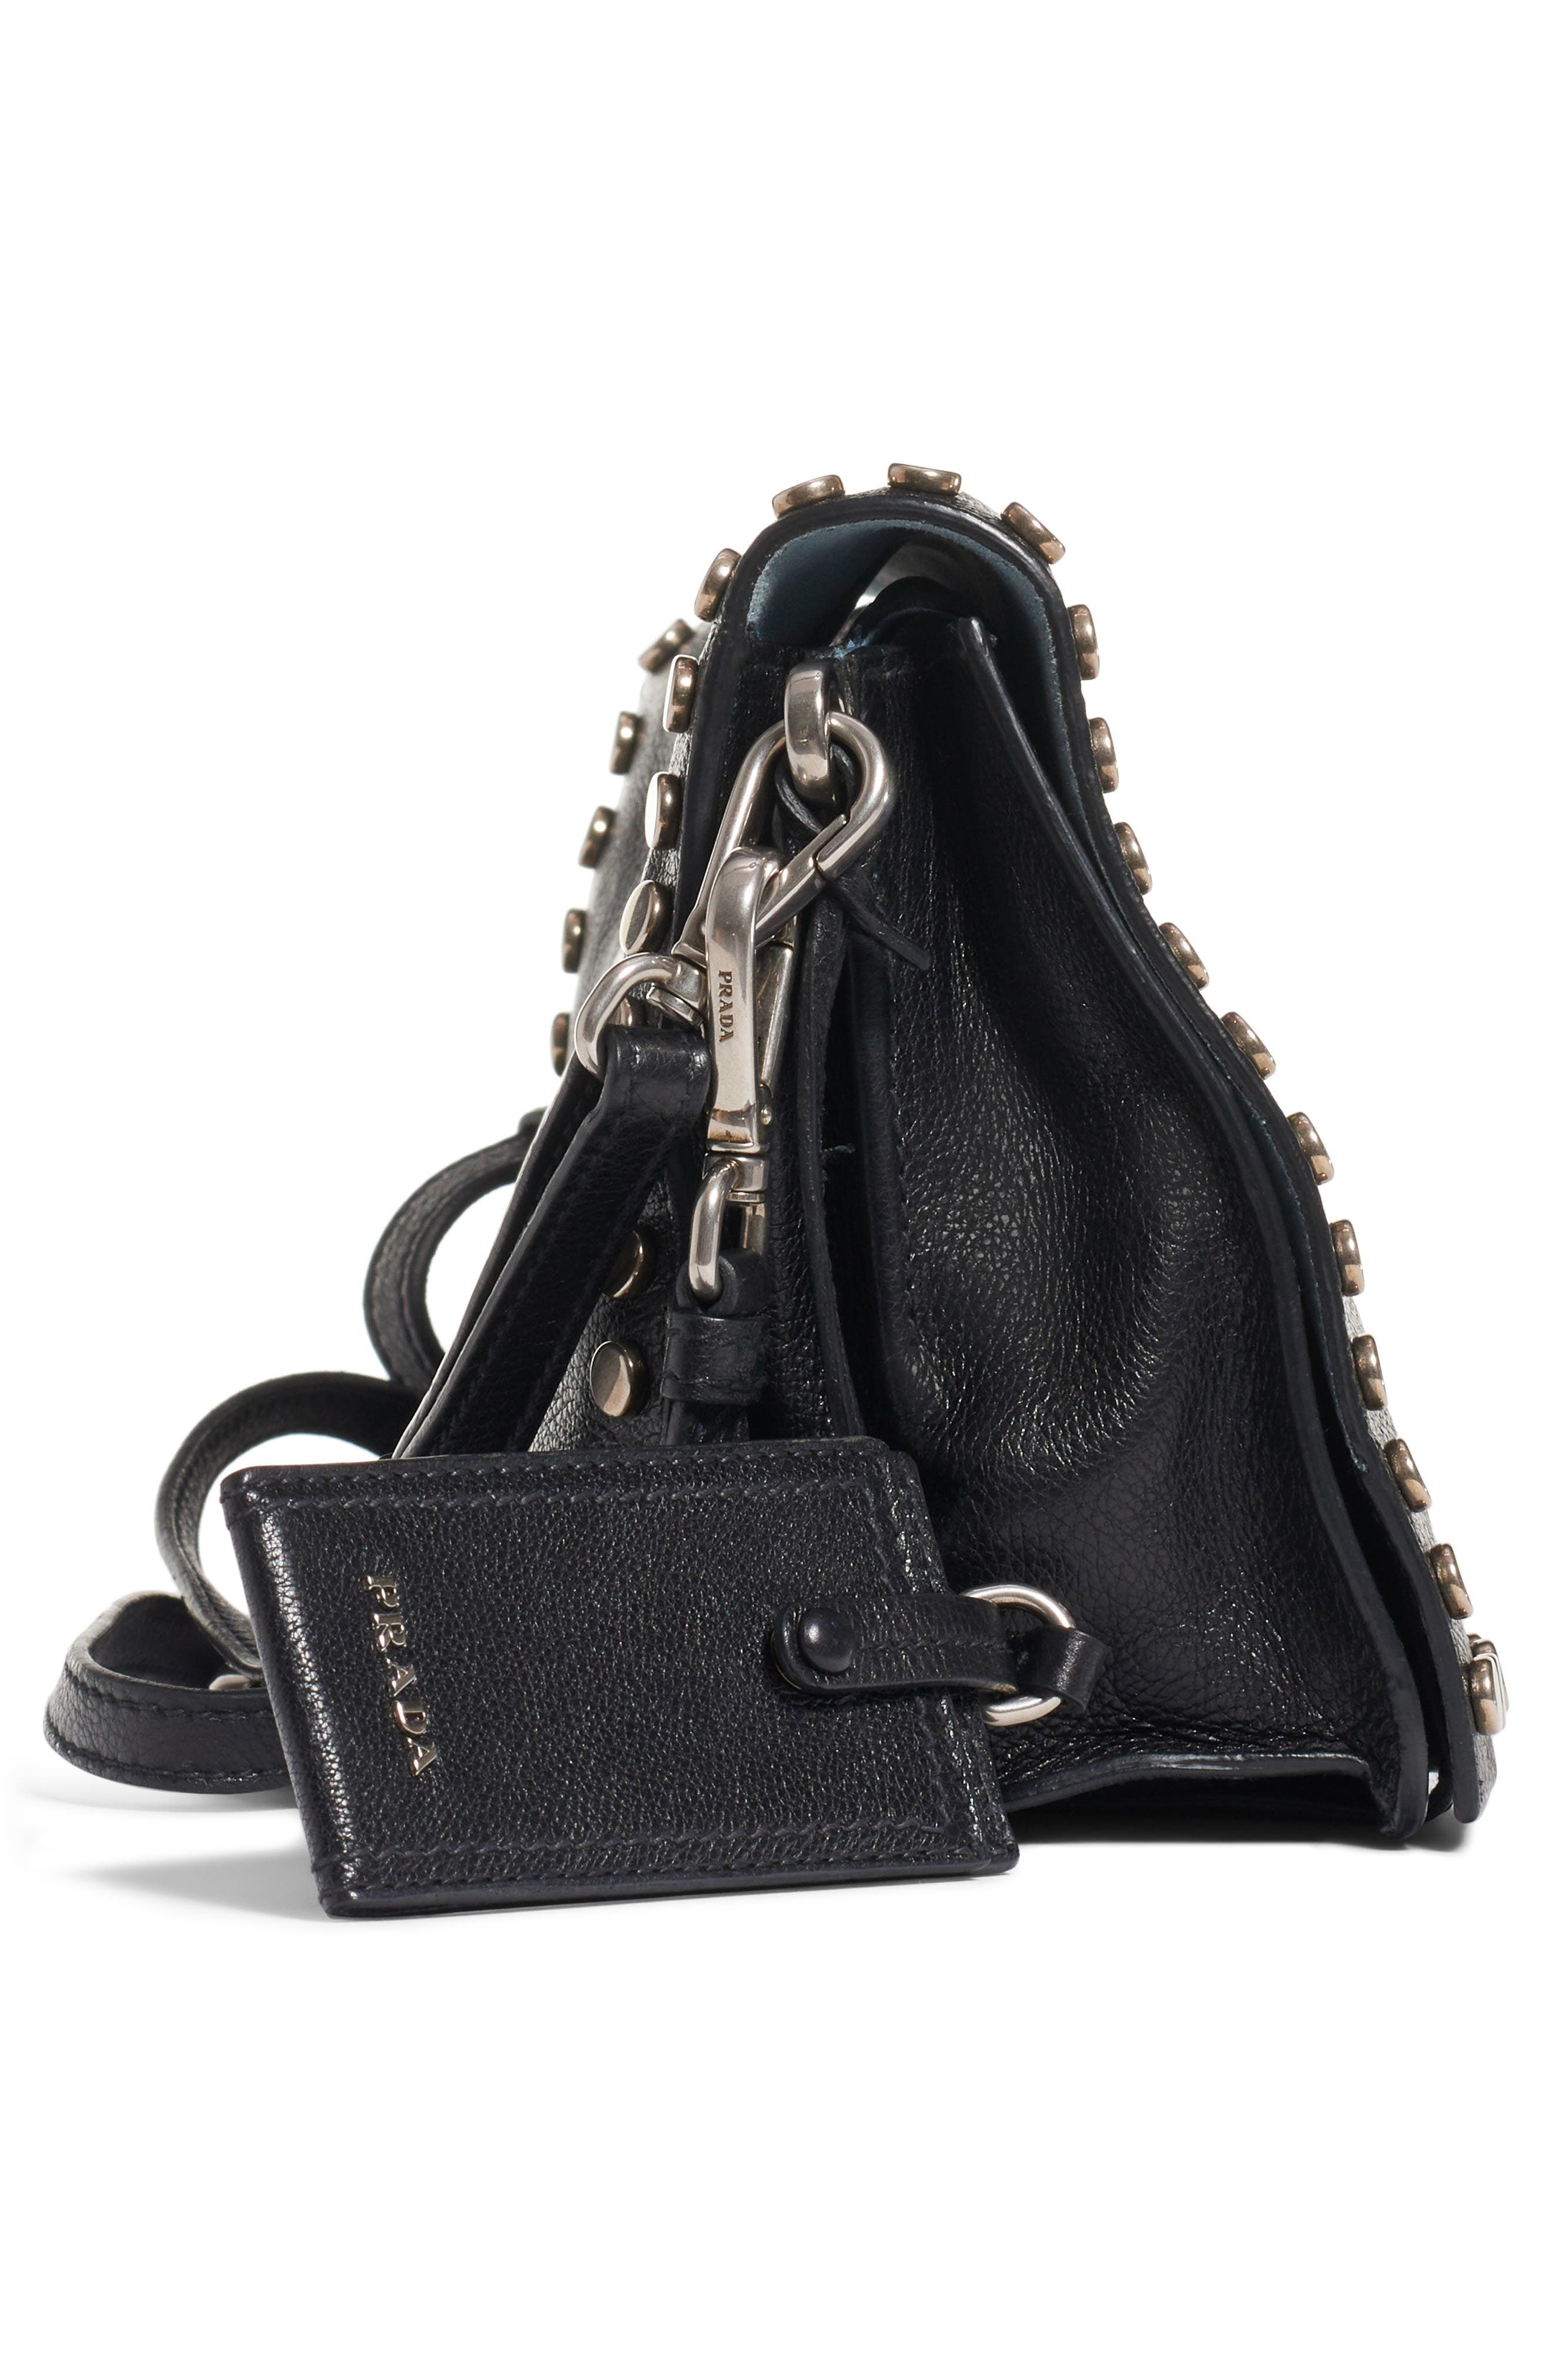 Small Stud Etiquette Shoulder Bag,                             Alternate thumbnail 4, color,                             NERO/ ASTRALE